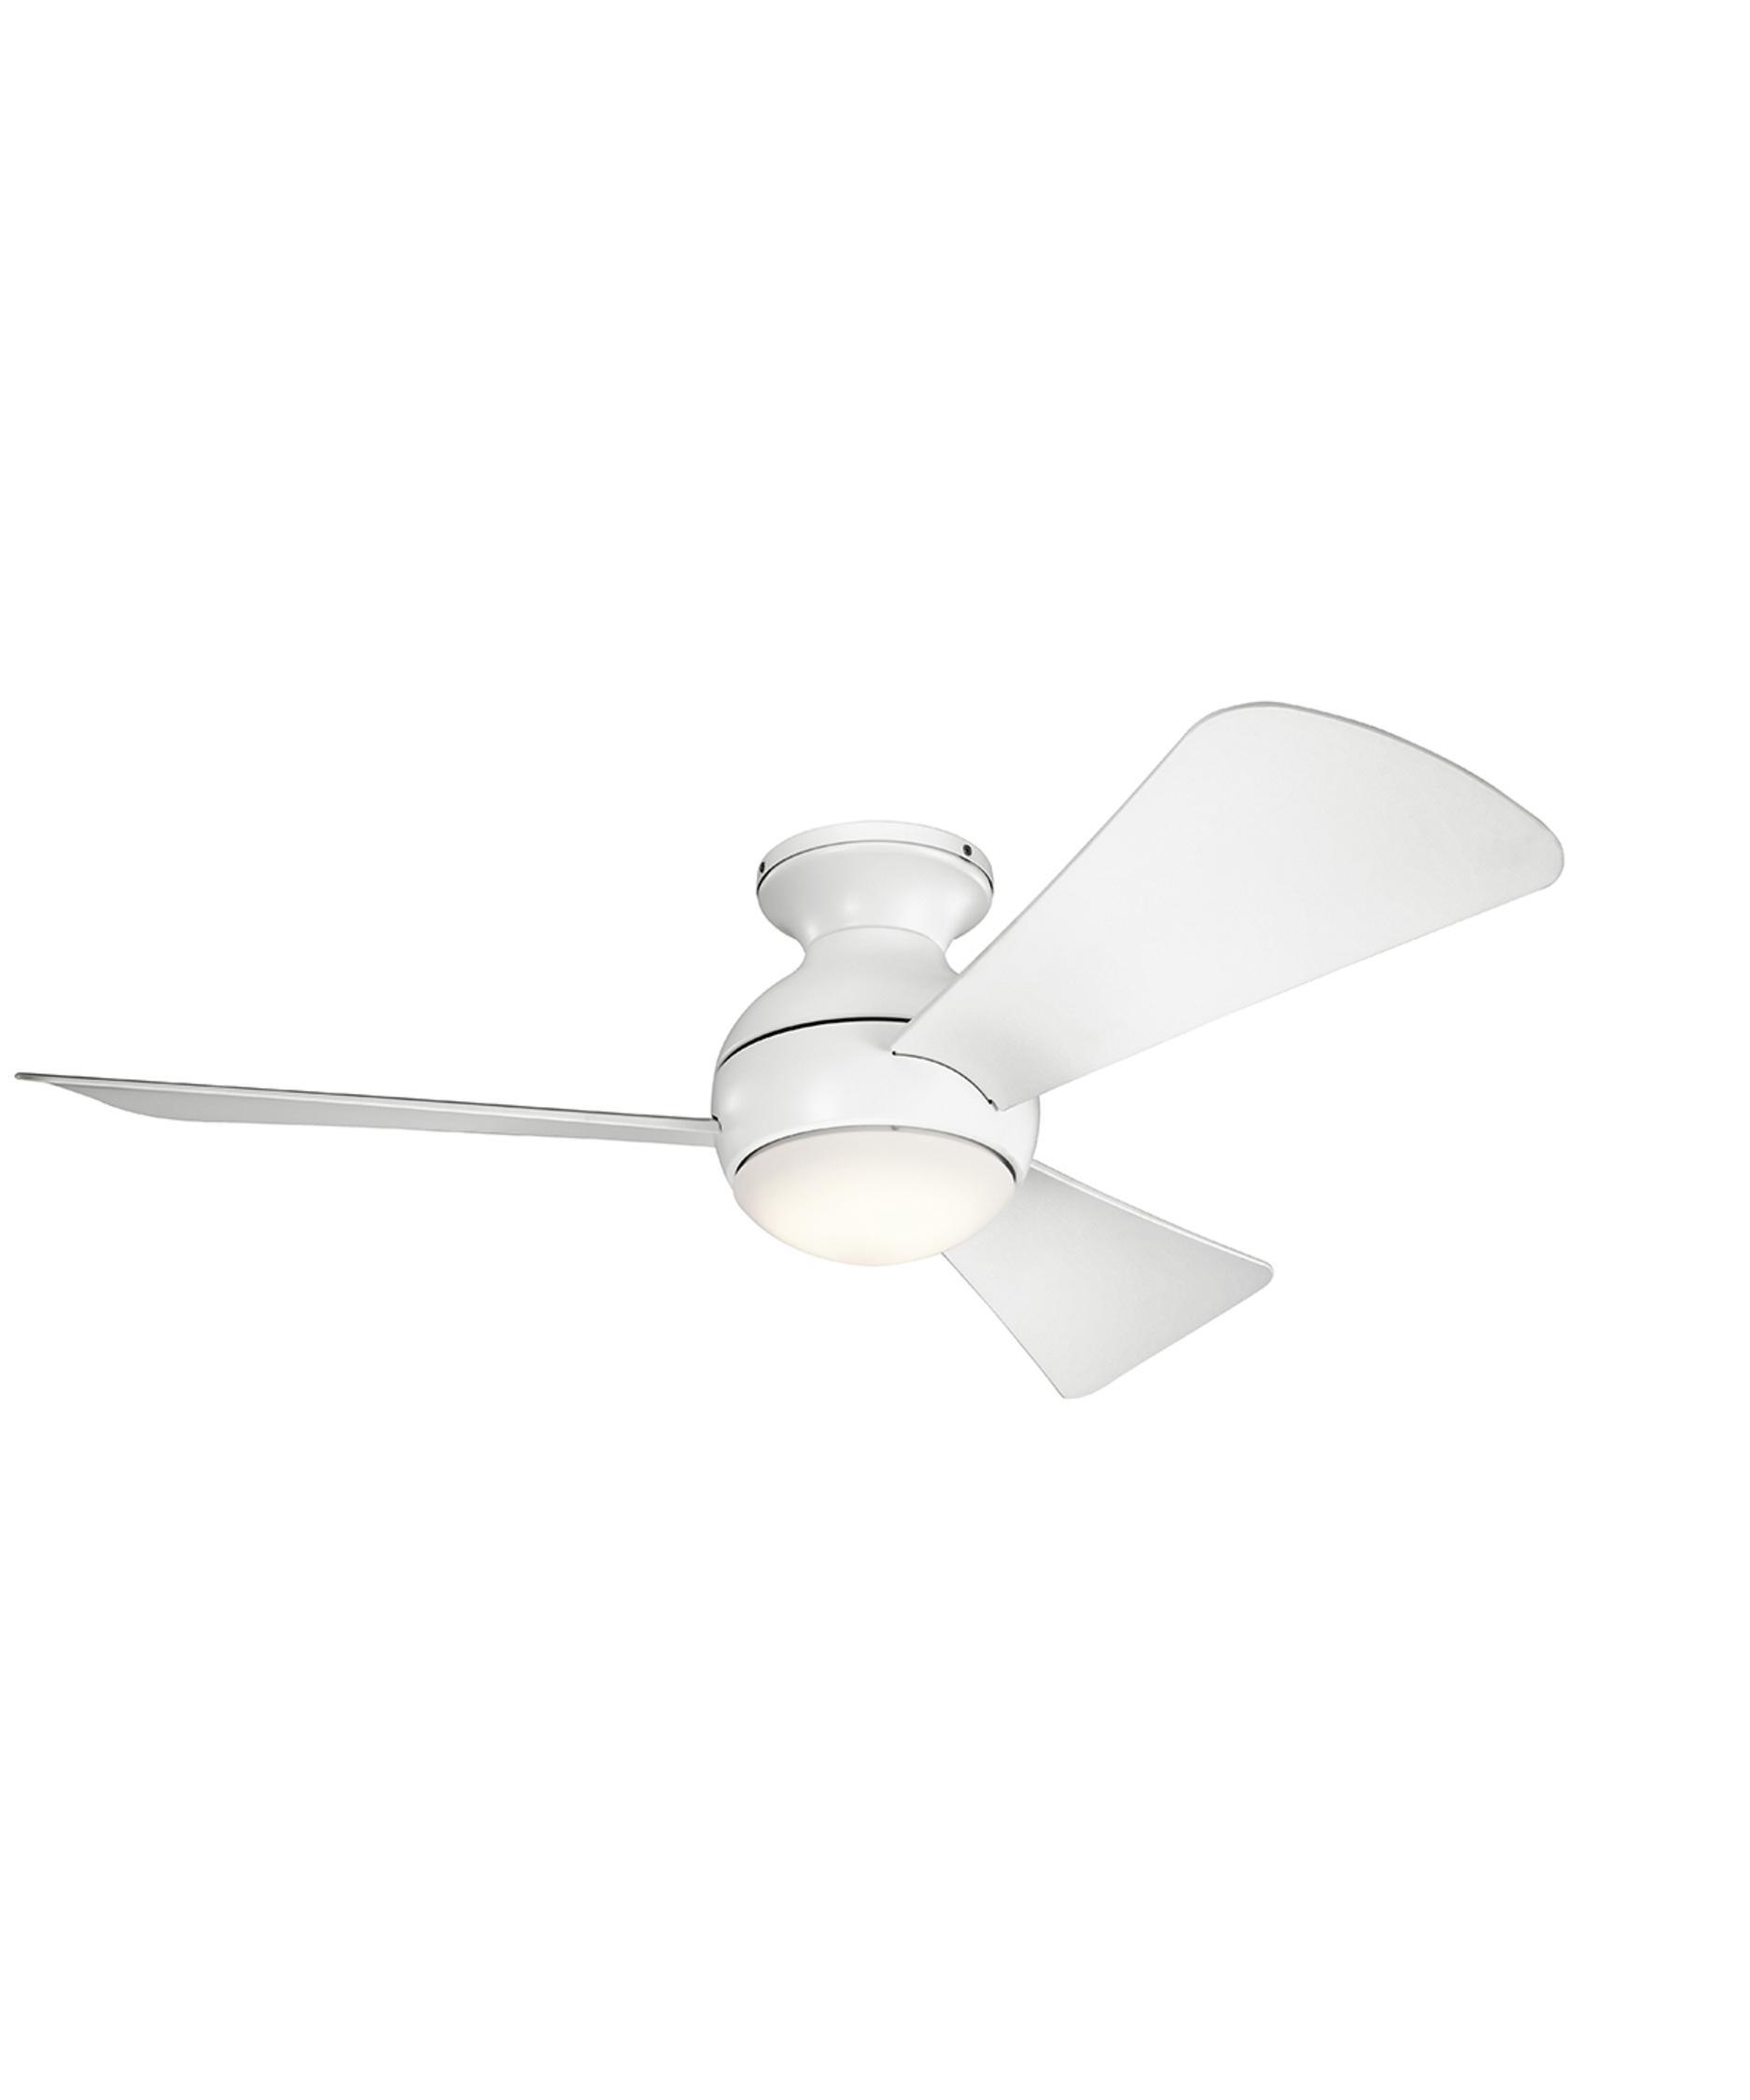 kichler sola 44 inch 3 blade flush mount fan capitol lighting - Kichler Fans